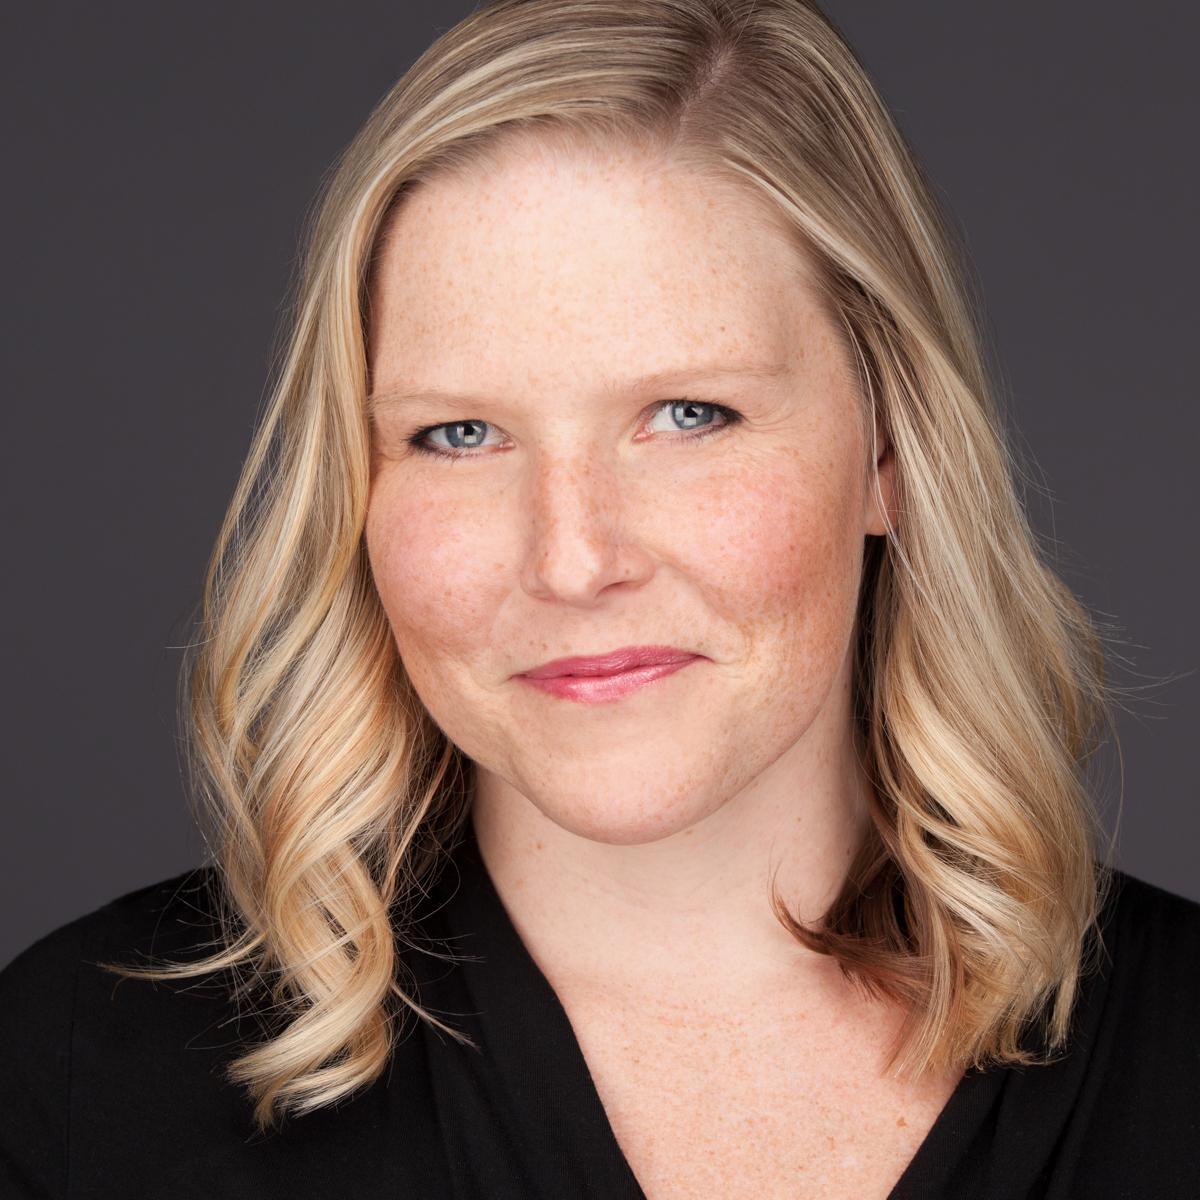 headshot of SLC UT based headshot photographer Laura Kinser, dark background with confident and approachable smile